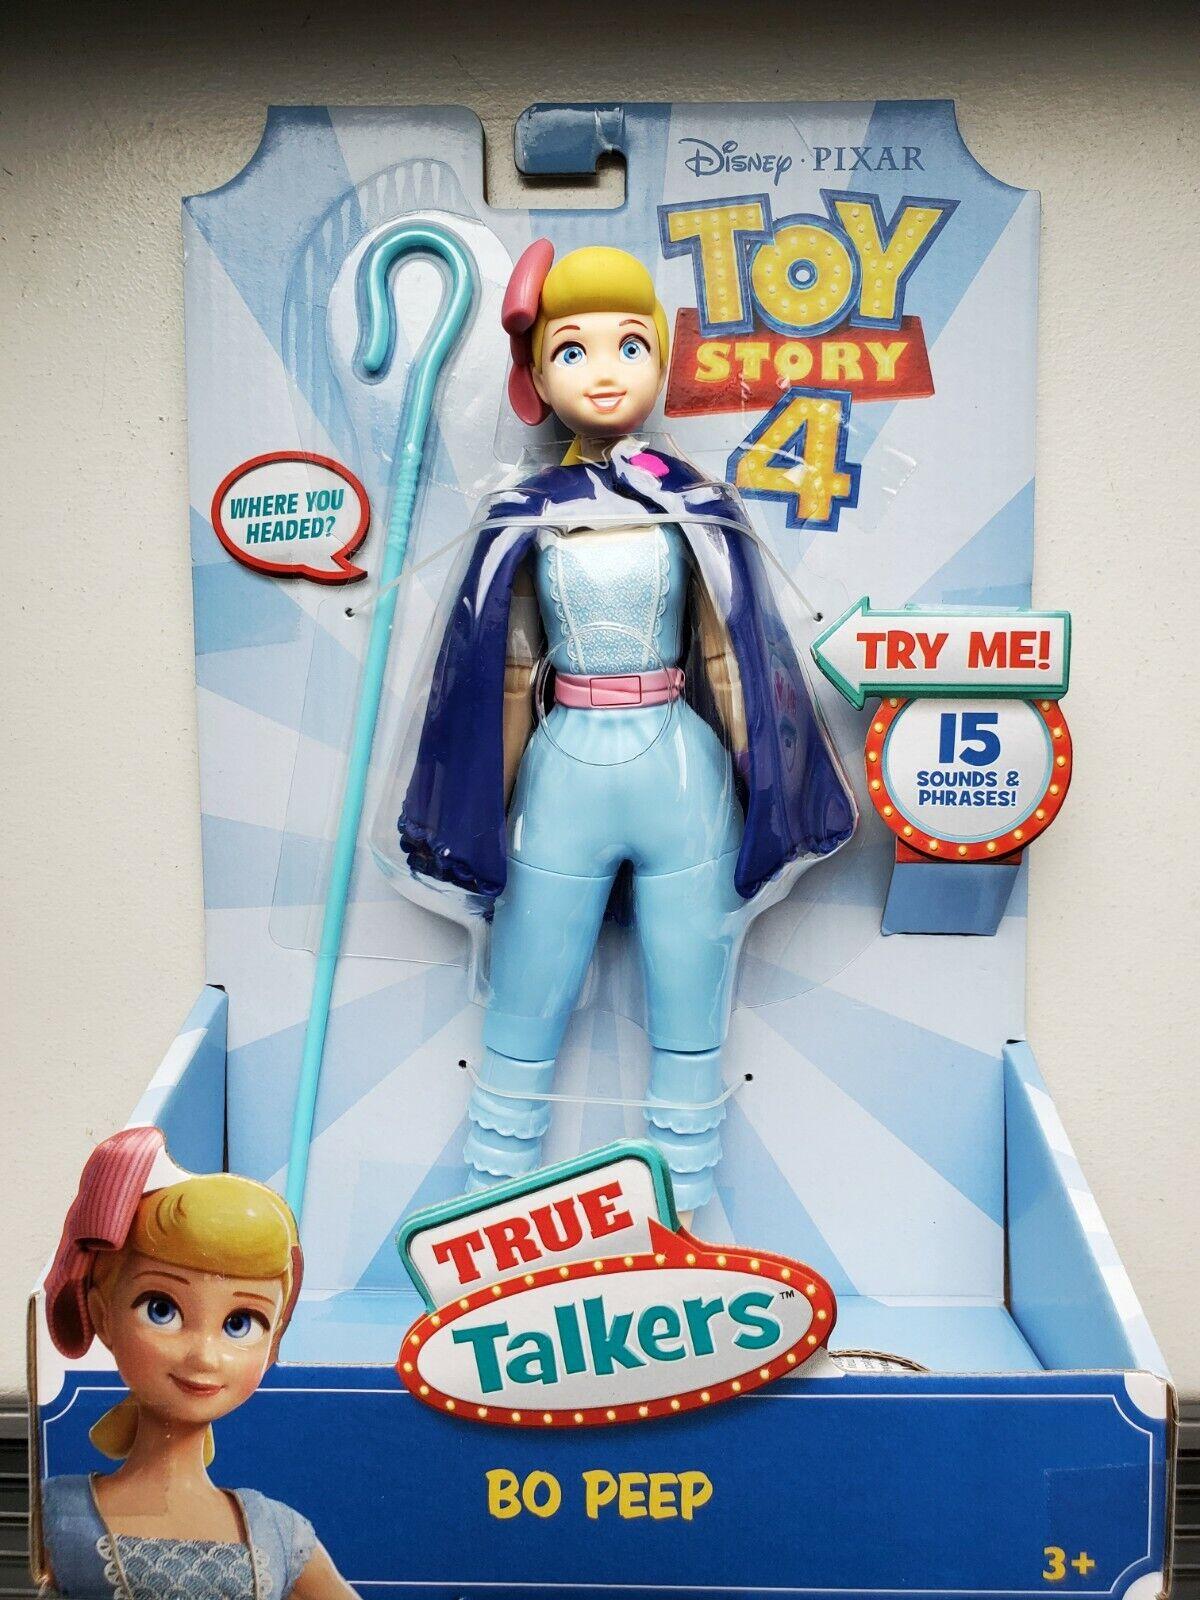 Disney Pixar Toy Story 4 Bo Peep Talking Action Figure 15 Sayings Buzz Woody Rex